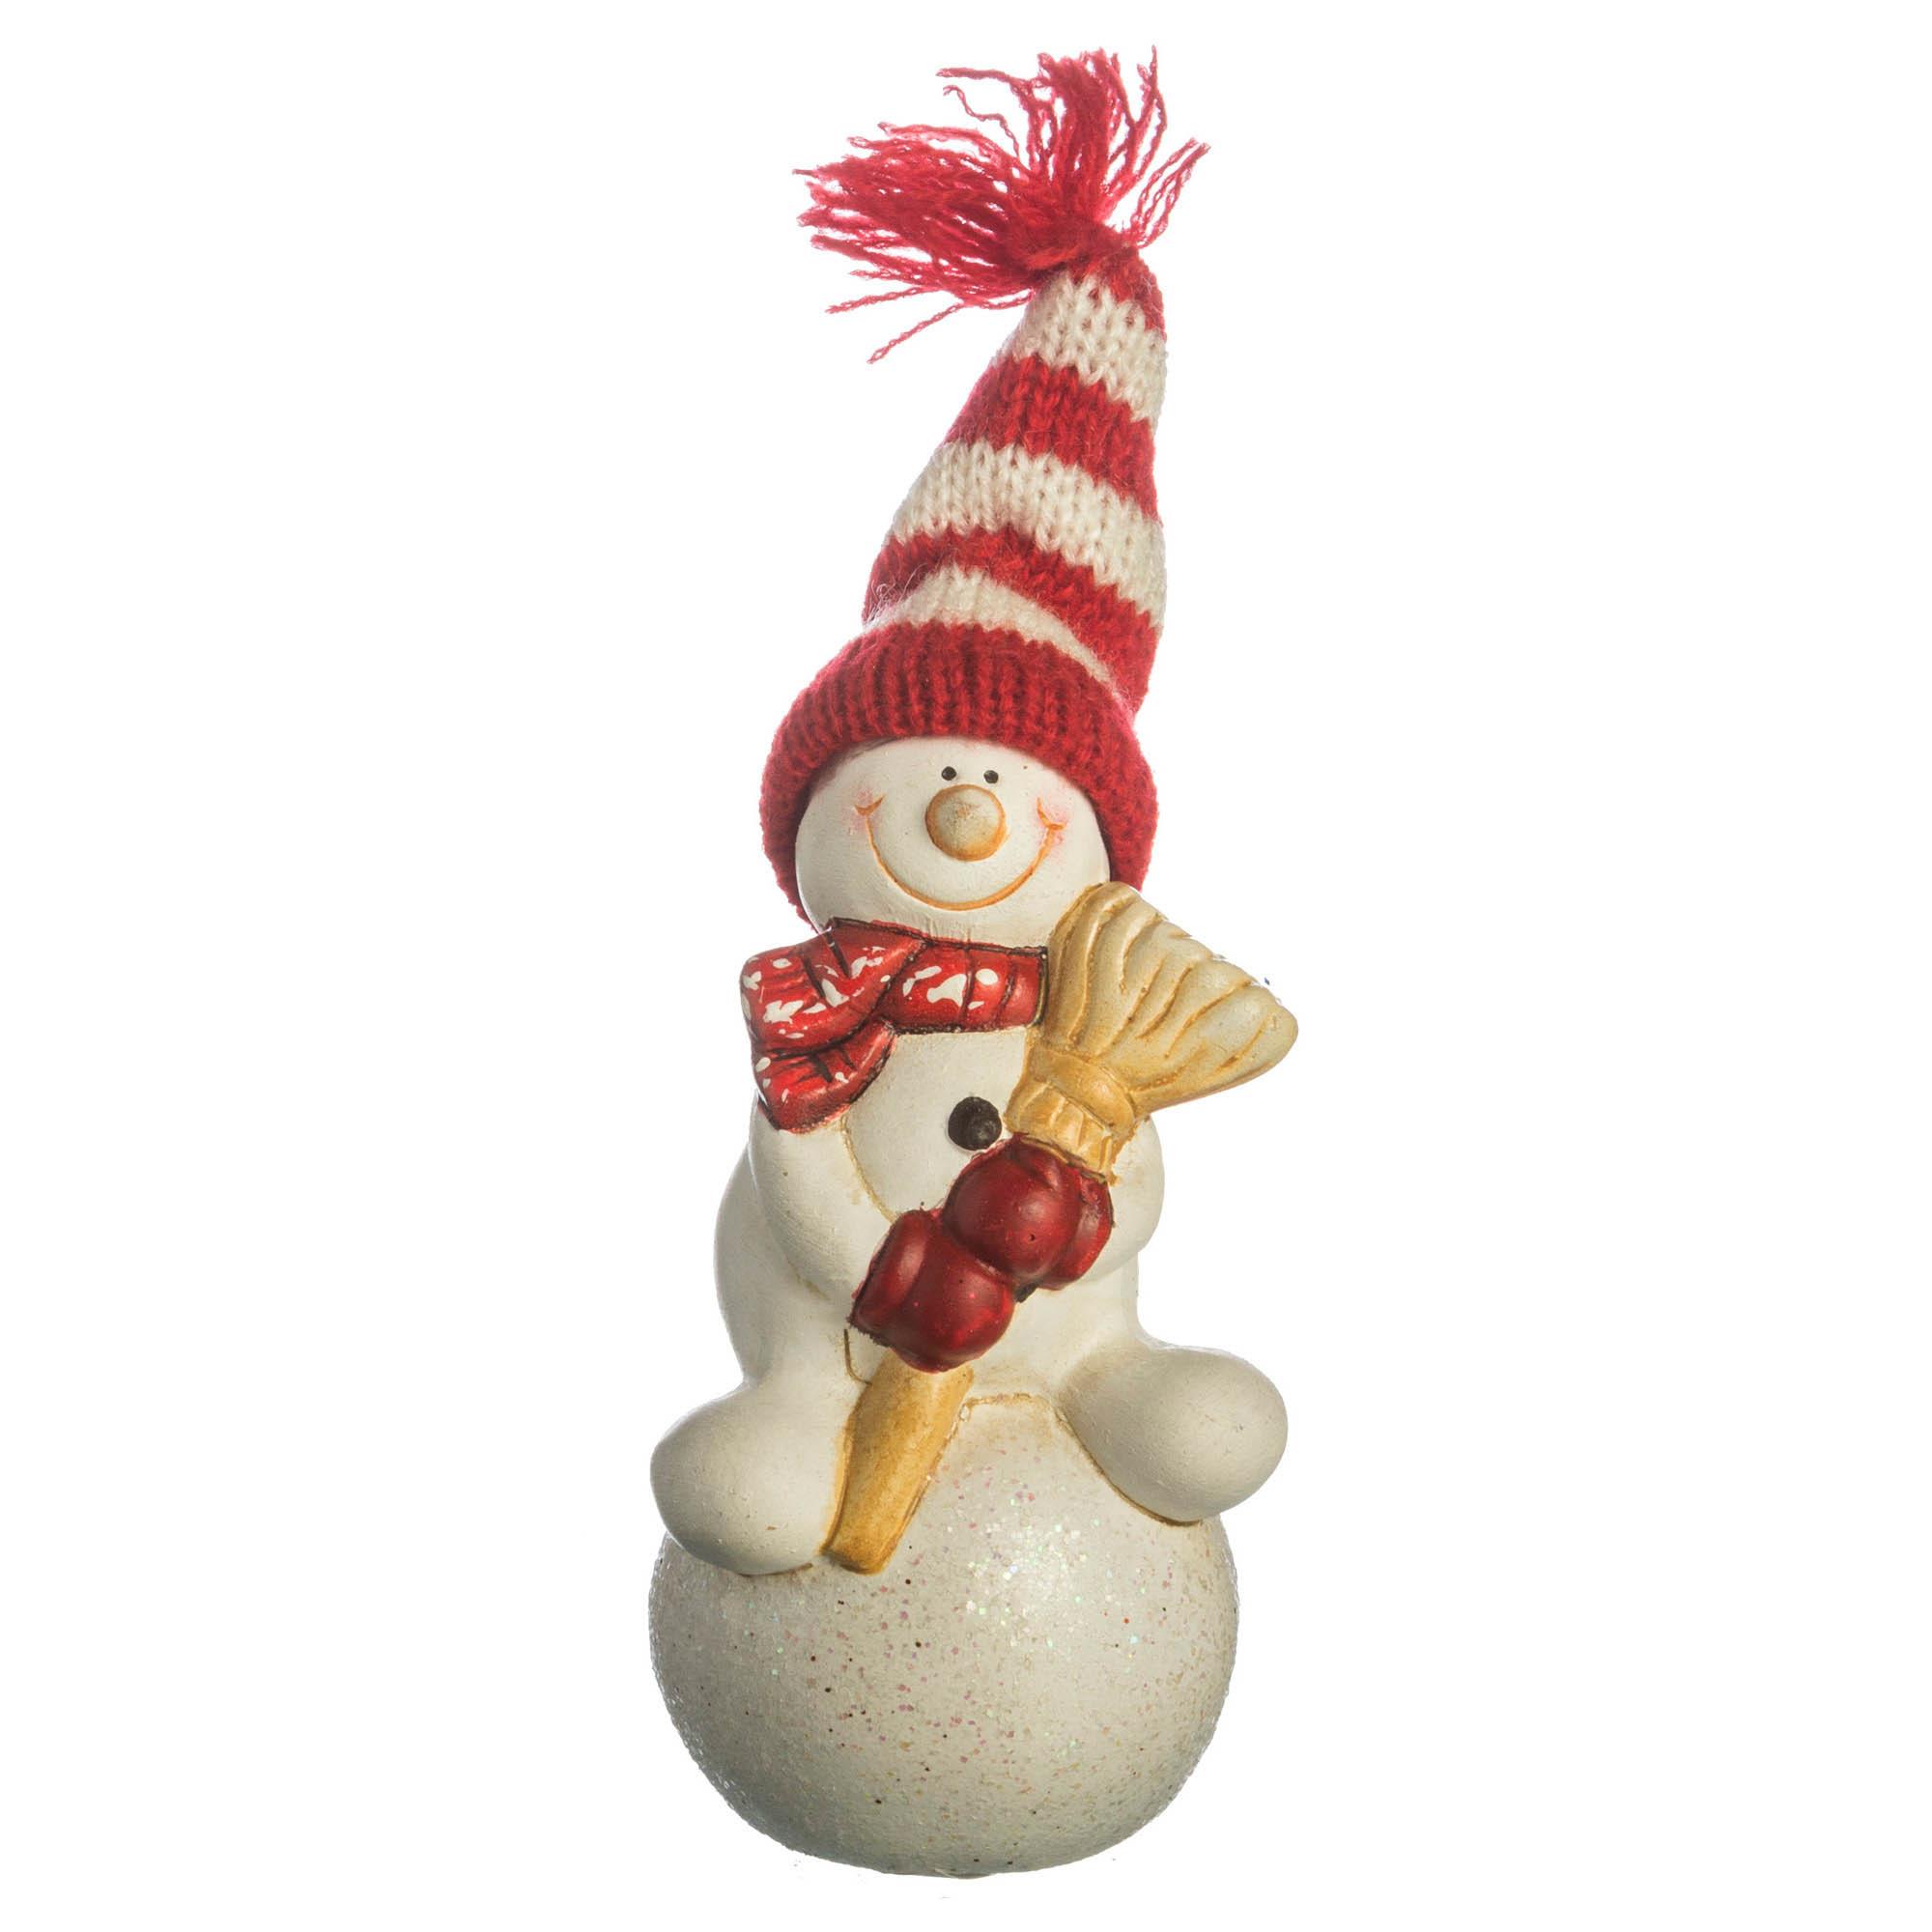 {} Lefard Интерьерная игрушка Снеговик (5х6х11 см) миниатюра снеговик цвет серебристый 6 5 см